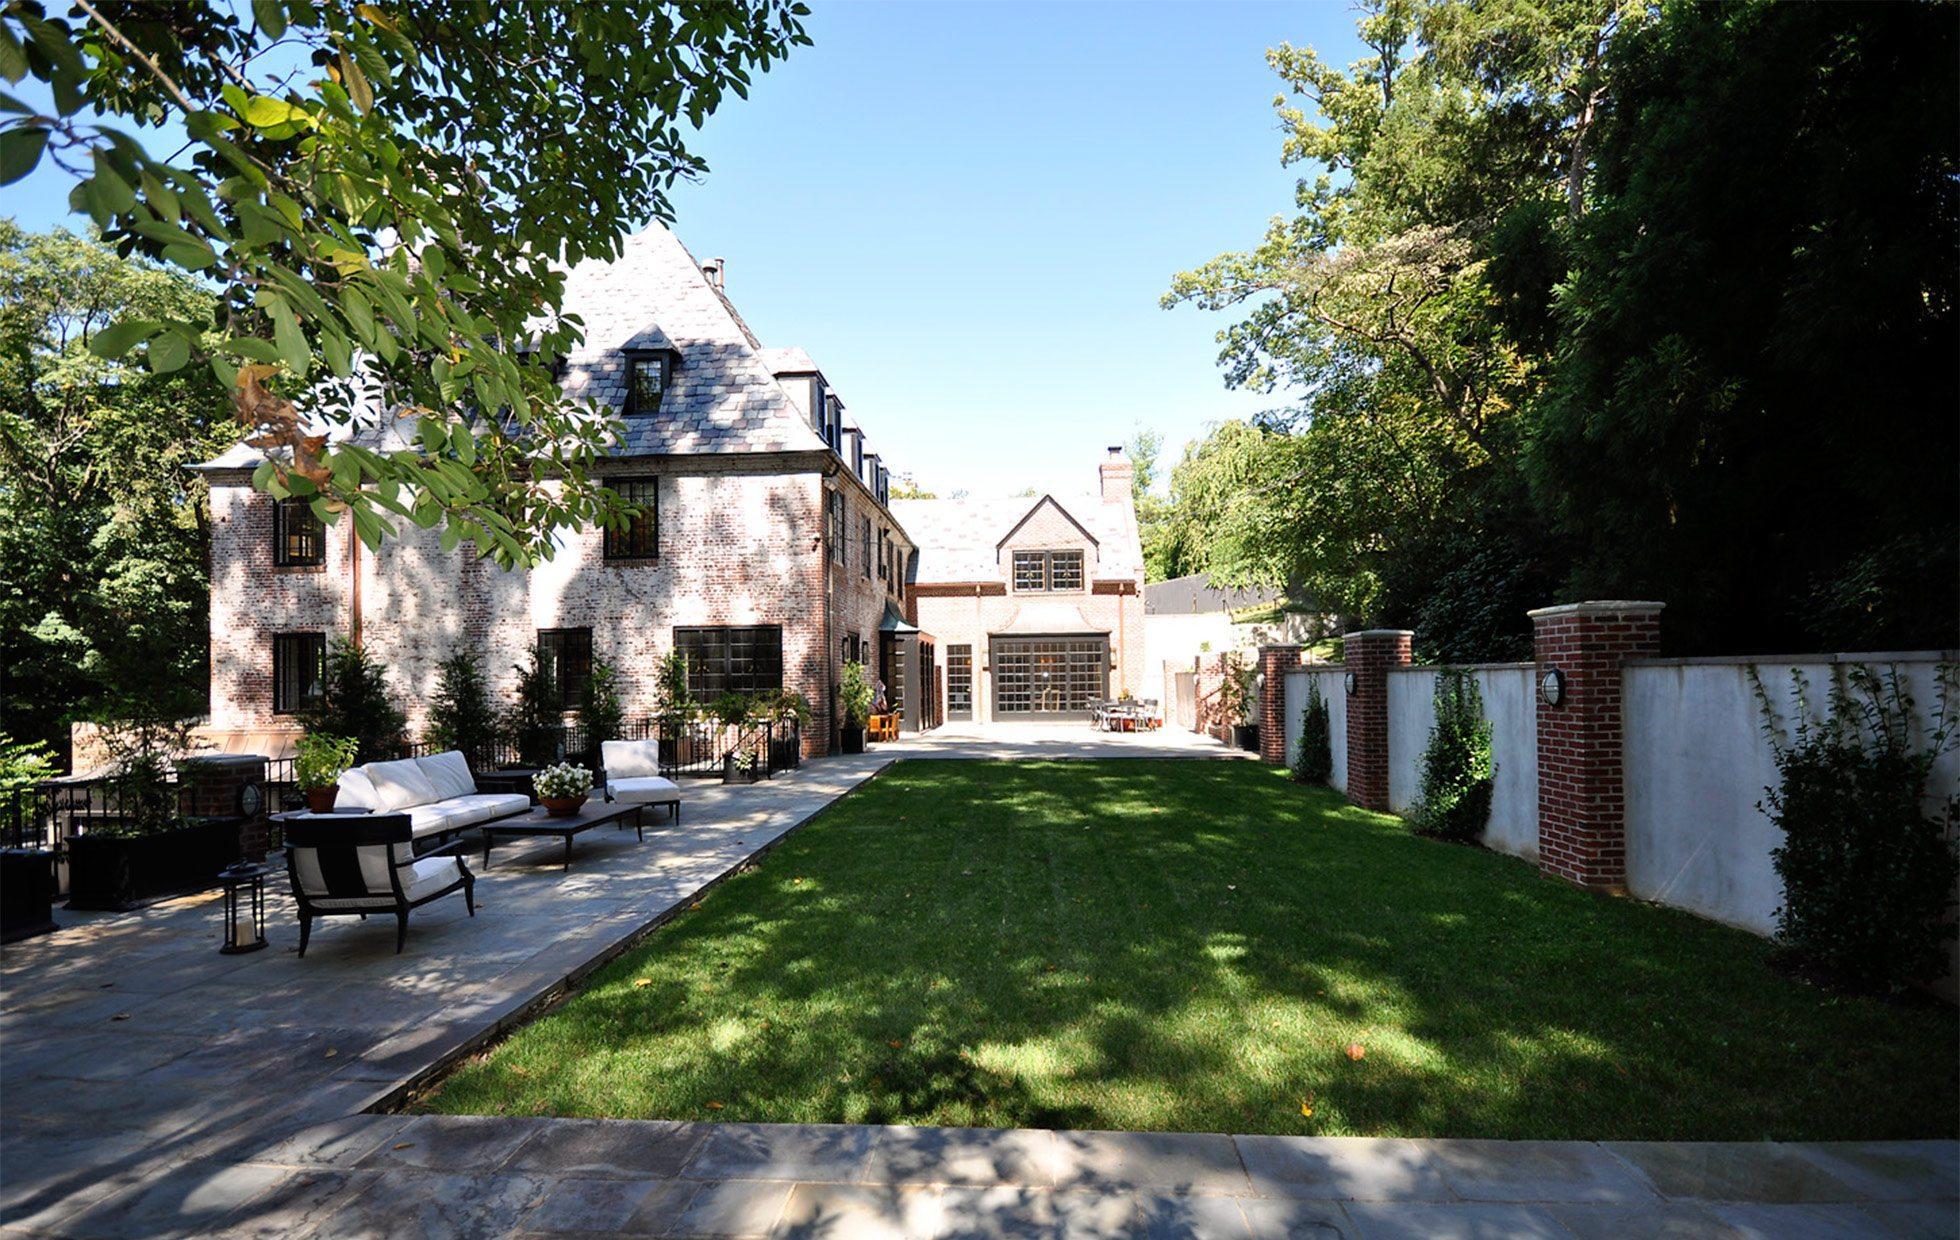 5882009a067ea2446-Belmont-Road-NW-Washington-DC-Obamas-New-Home-Backyard